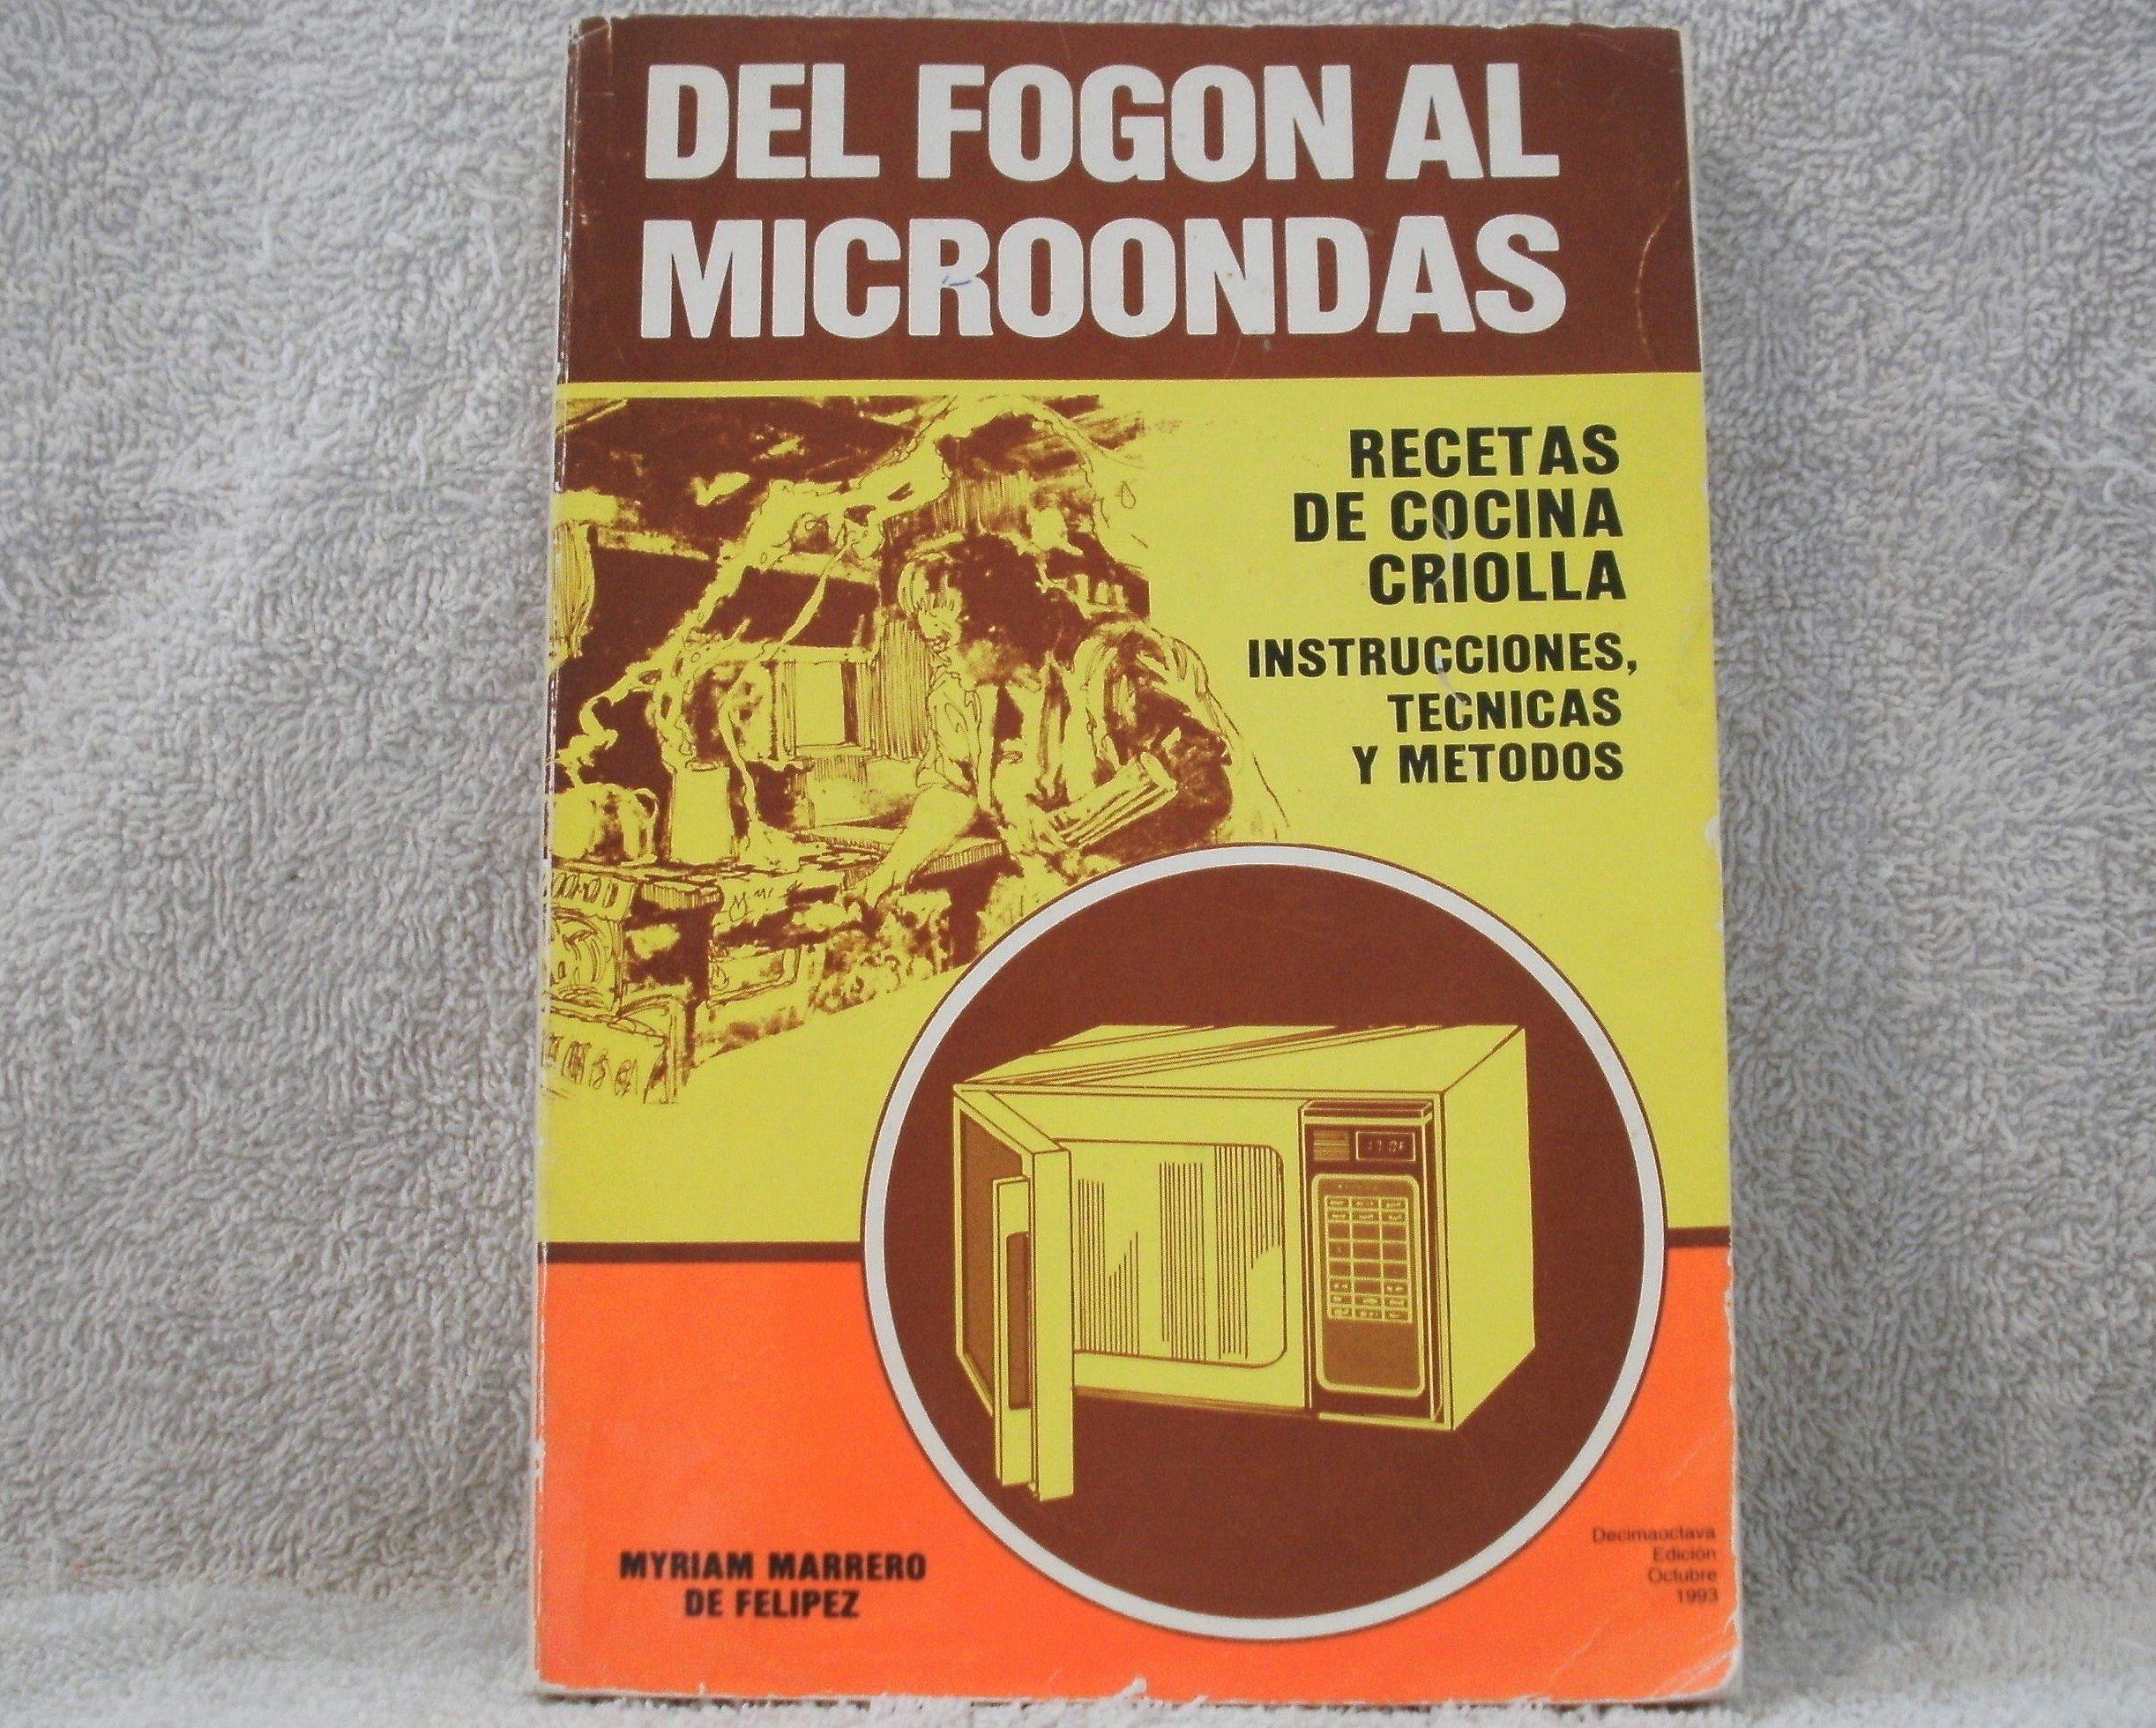 DEL FOGON AL MICROONDAS: Amazon.com: Books